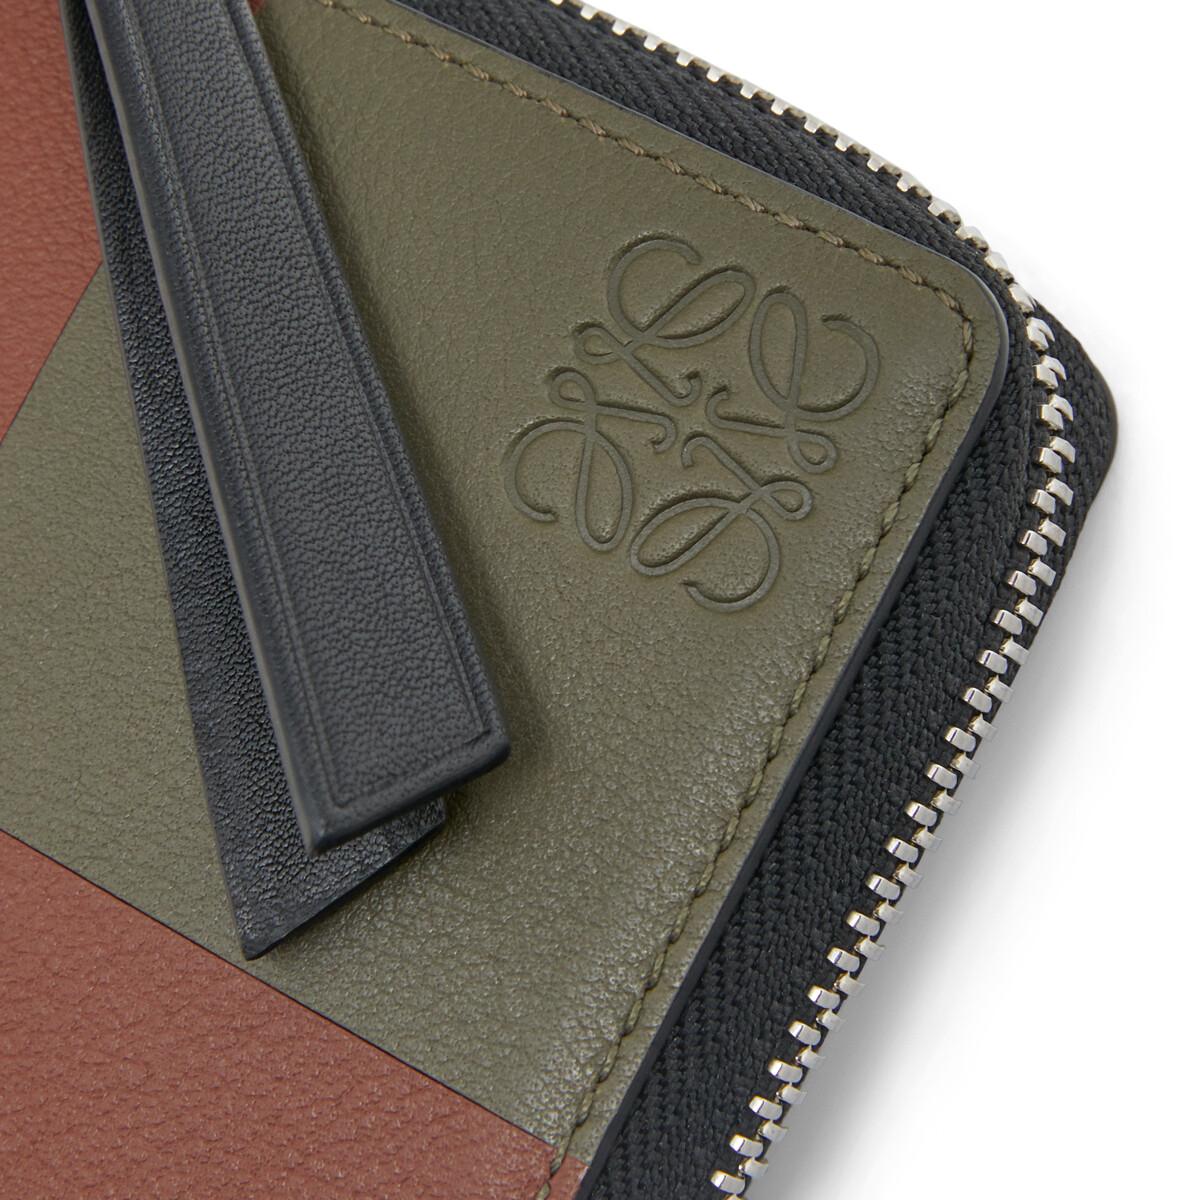 LOEWE Cartera Cuadrada Bicolor Verde Kaki/Coñac front